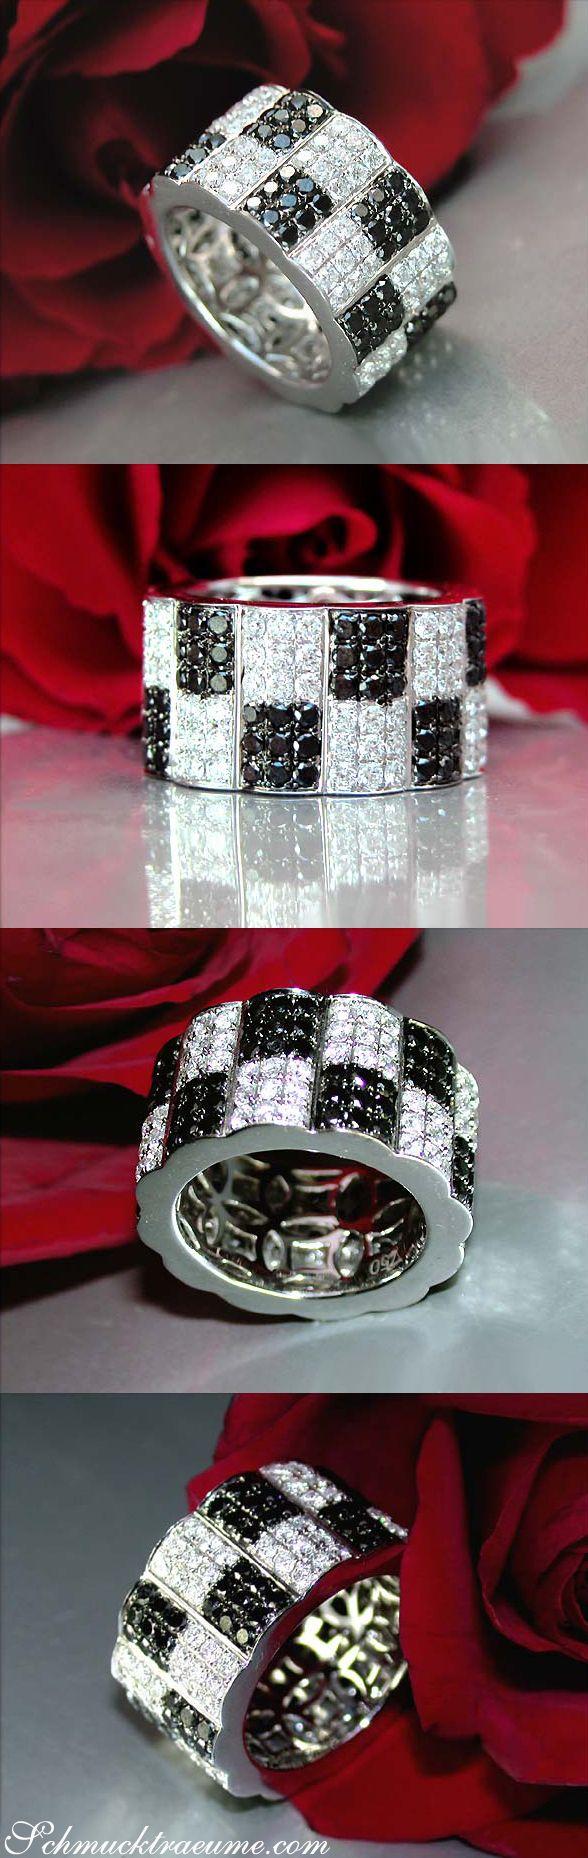 Puristischer Memoryring mit schwarzen Diamanten & Brillanten   Puristic Eternity Ring with Black and White Diamonds   Explore: Schmucktraeume.com   Like: https://www.facebook.com/pages/Noble-Juwelen/150871984924926